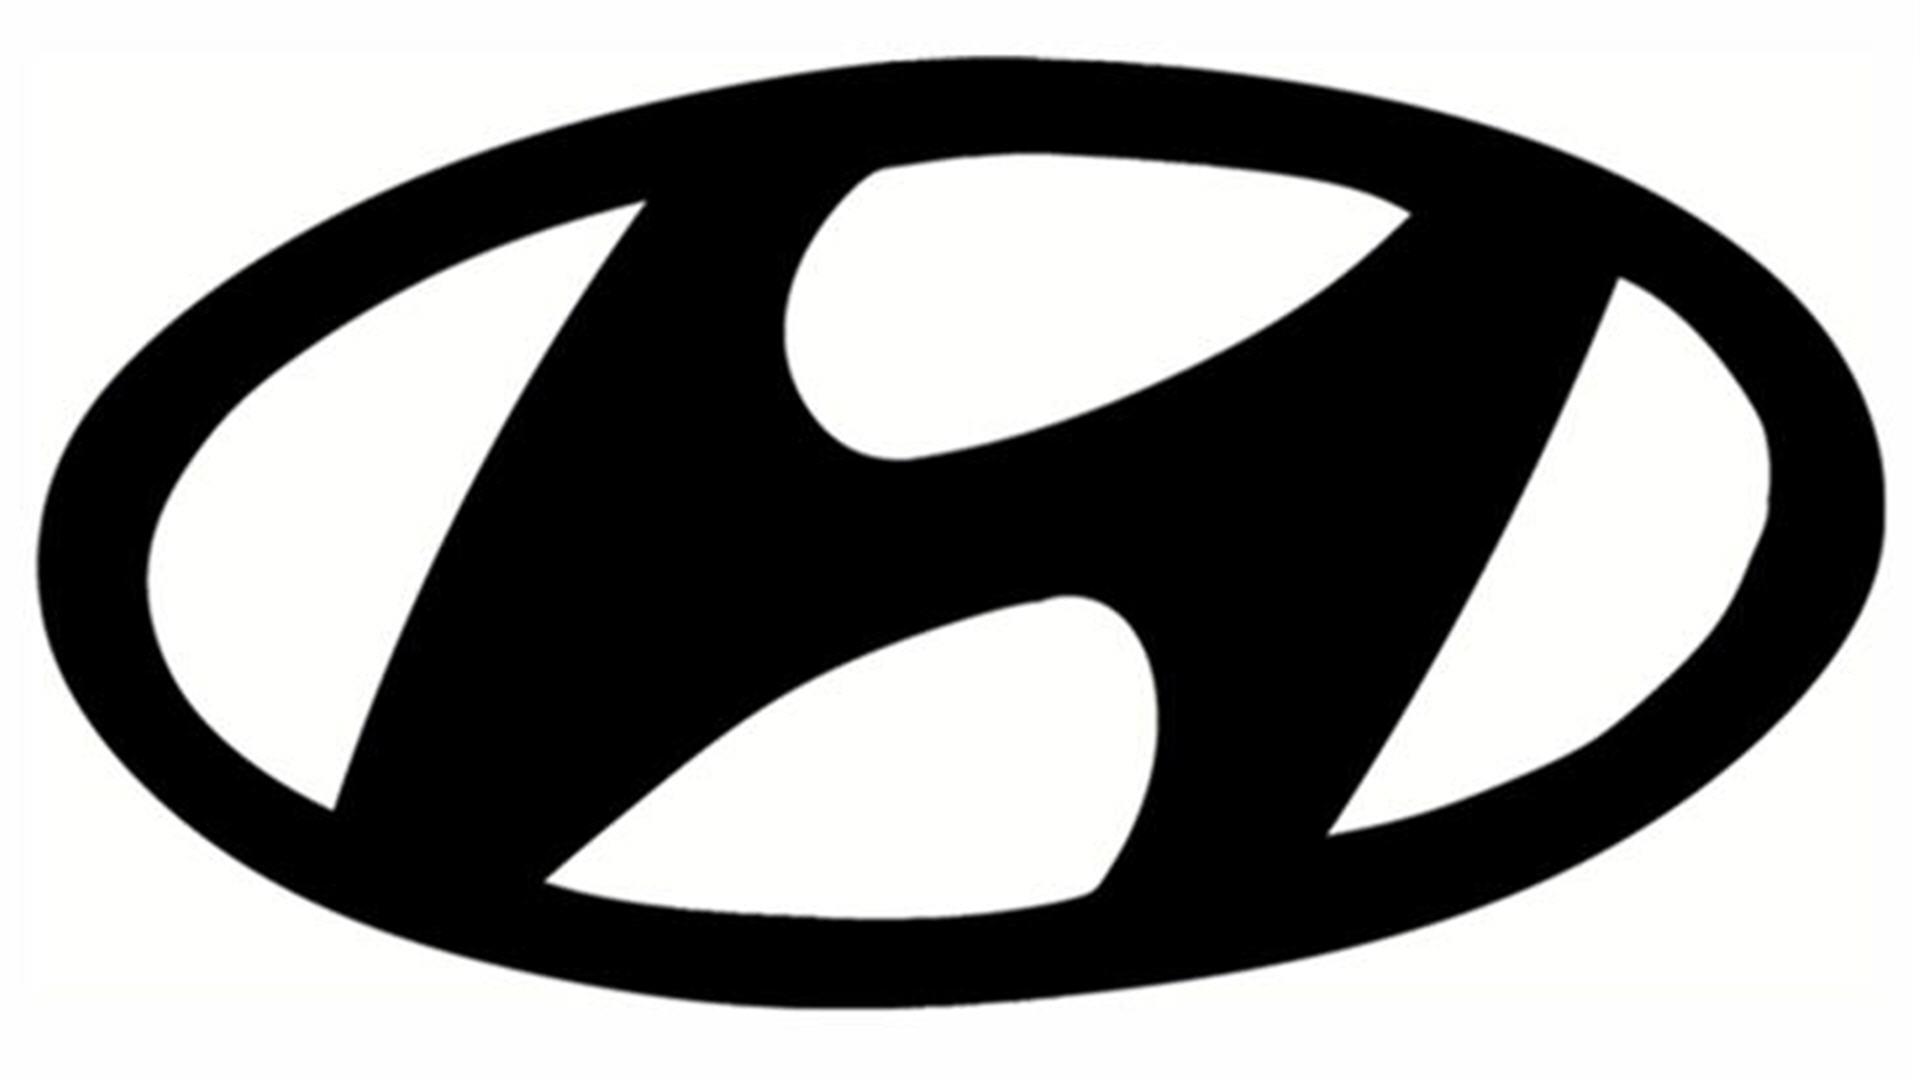 hyundai logo free transparent png logos facebook logo download official facebook logo download for website